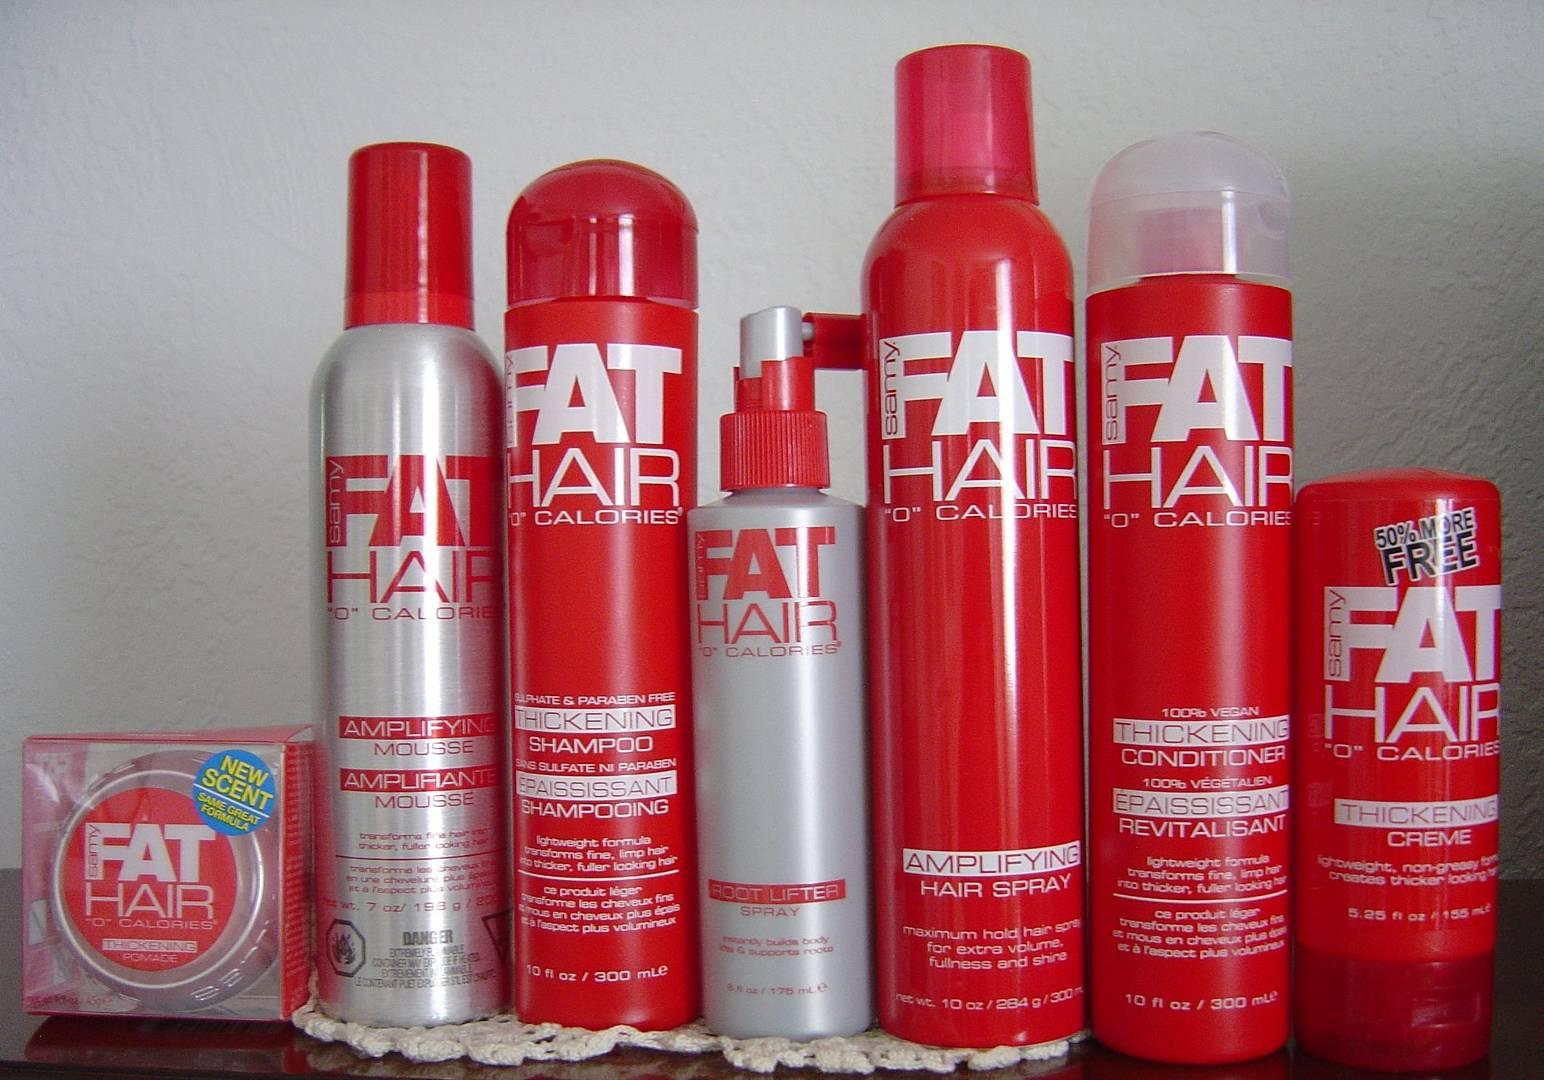 "Samy Fat Hair ""O"" Calories line"